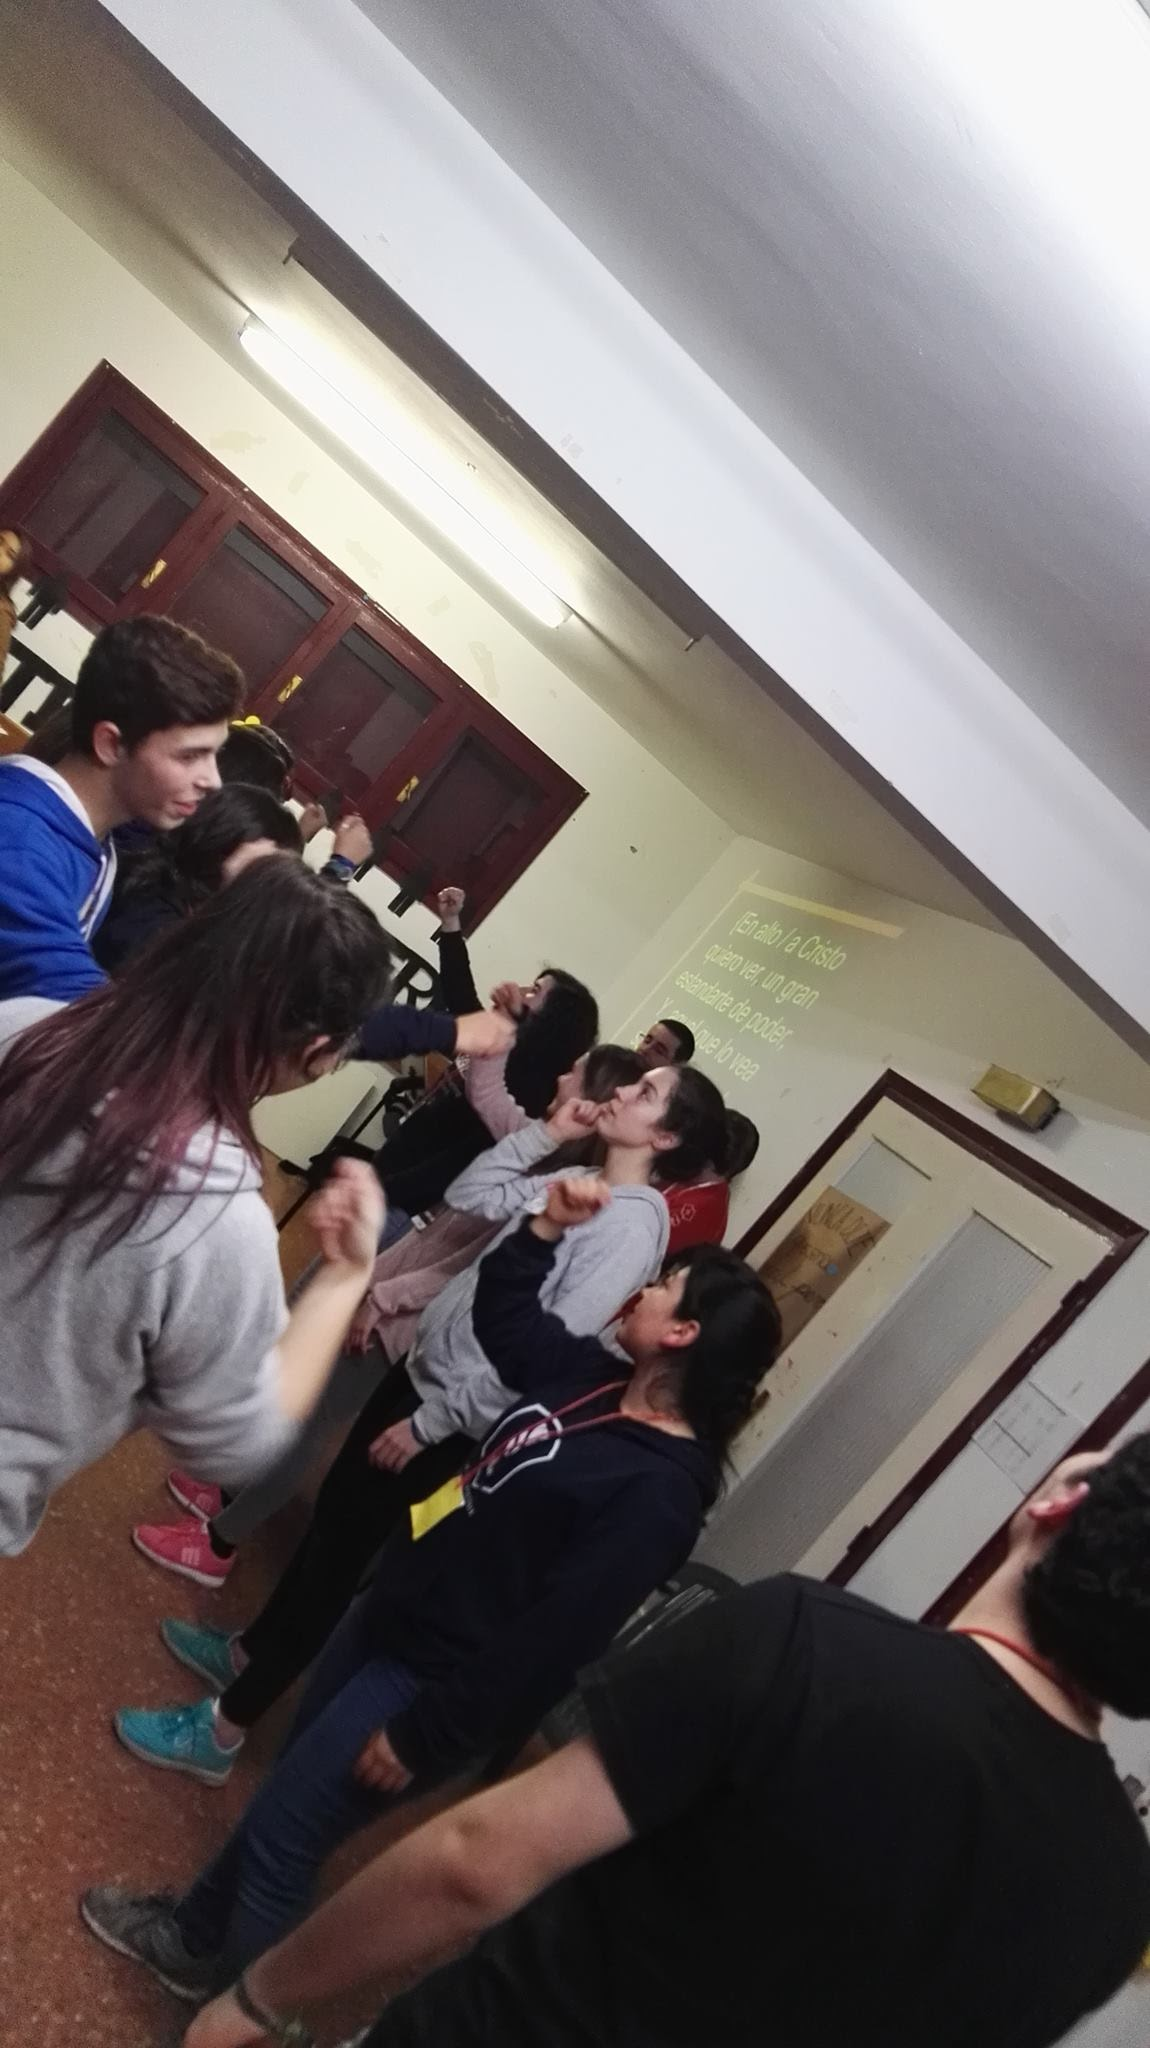 2017.02.17y18 - Desafió ATREVETE A SER DIFERENTE (3).jpg